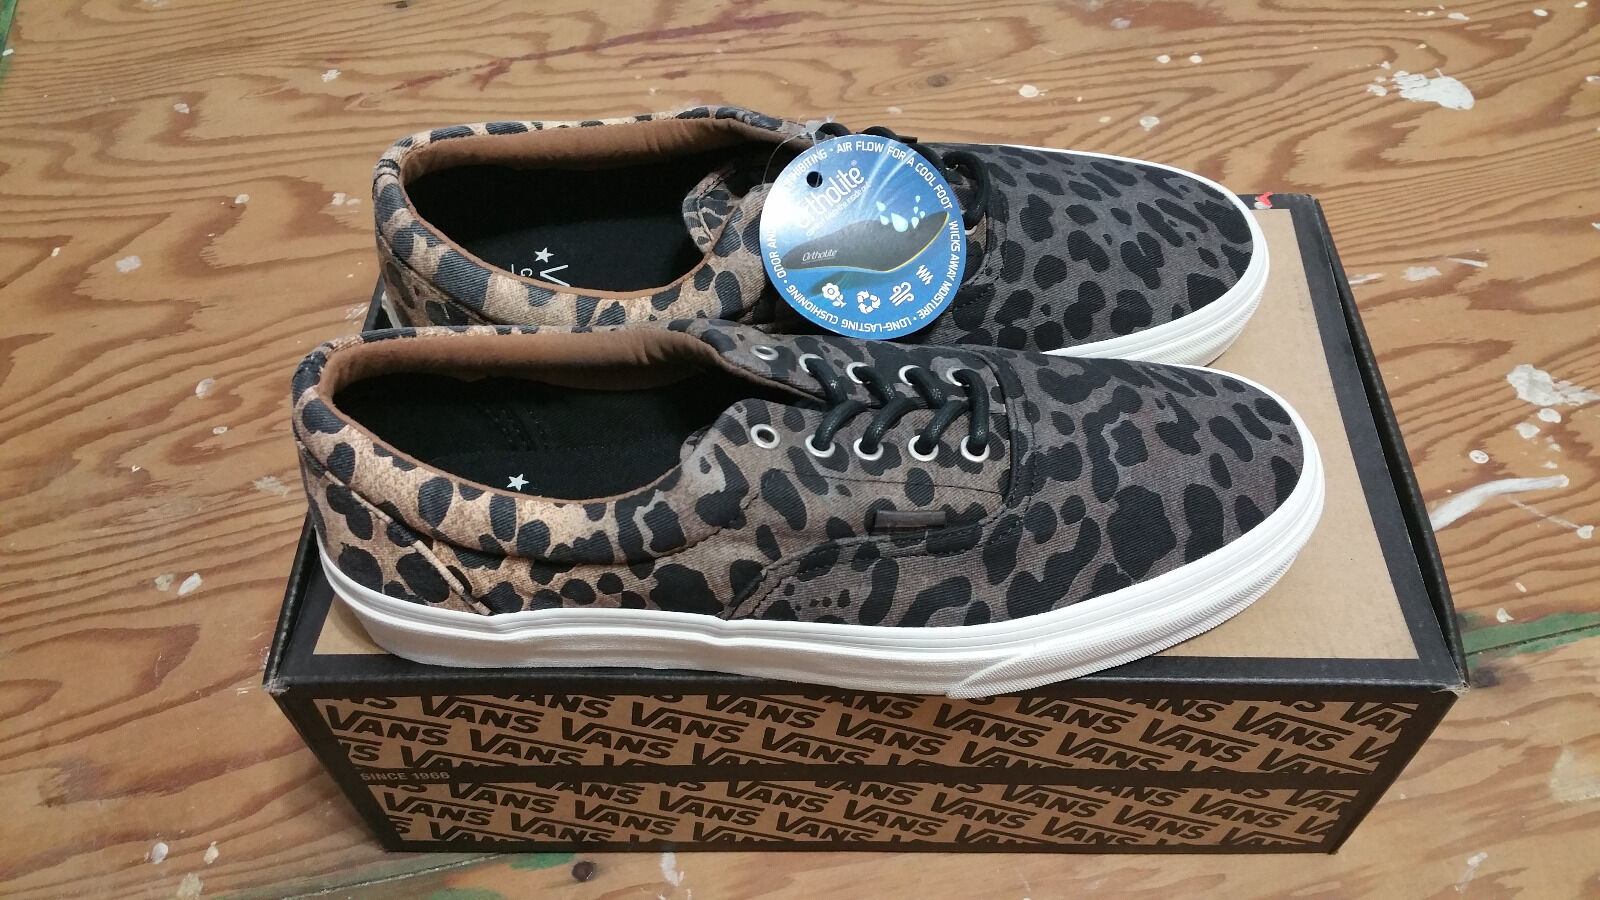 Vans Era CA Ombre Dyed Cheetah Black Men's Skate Shoes Size 10 supreme wtaps